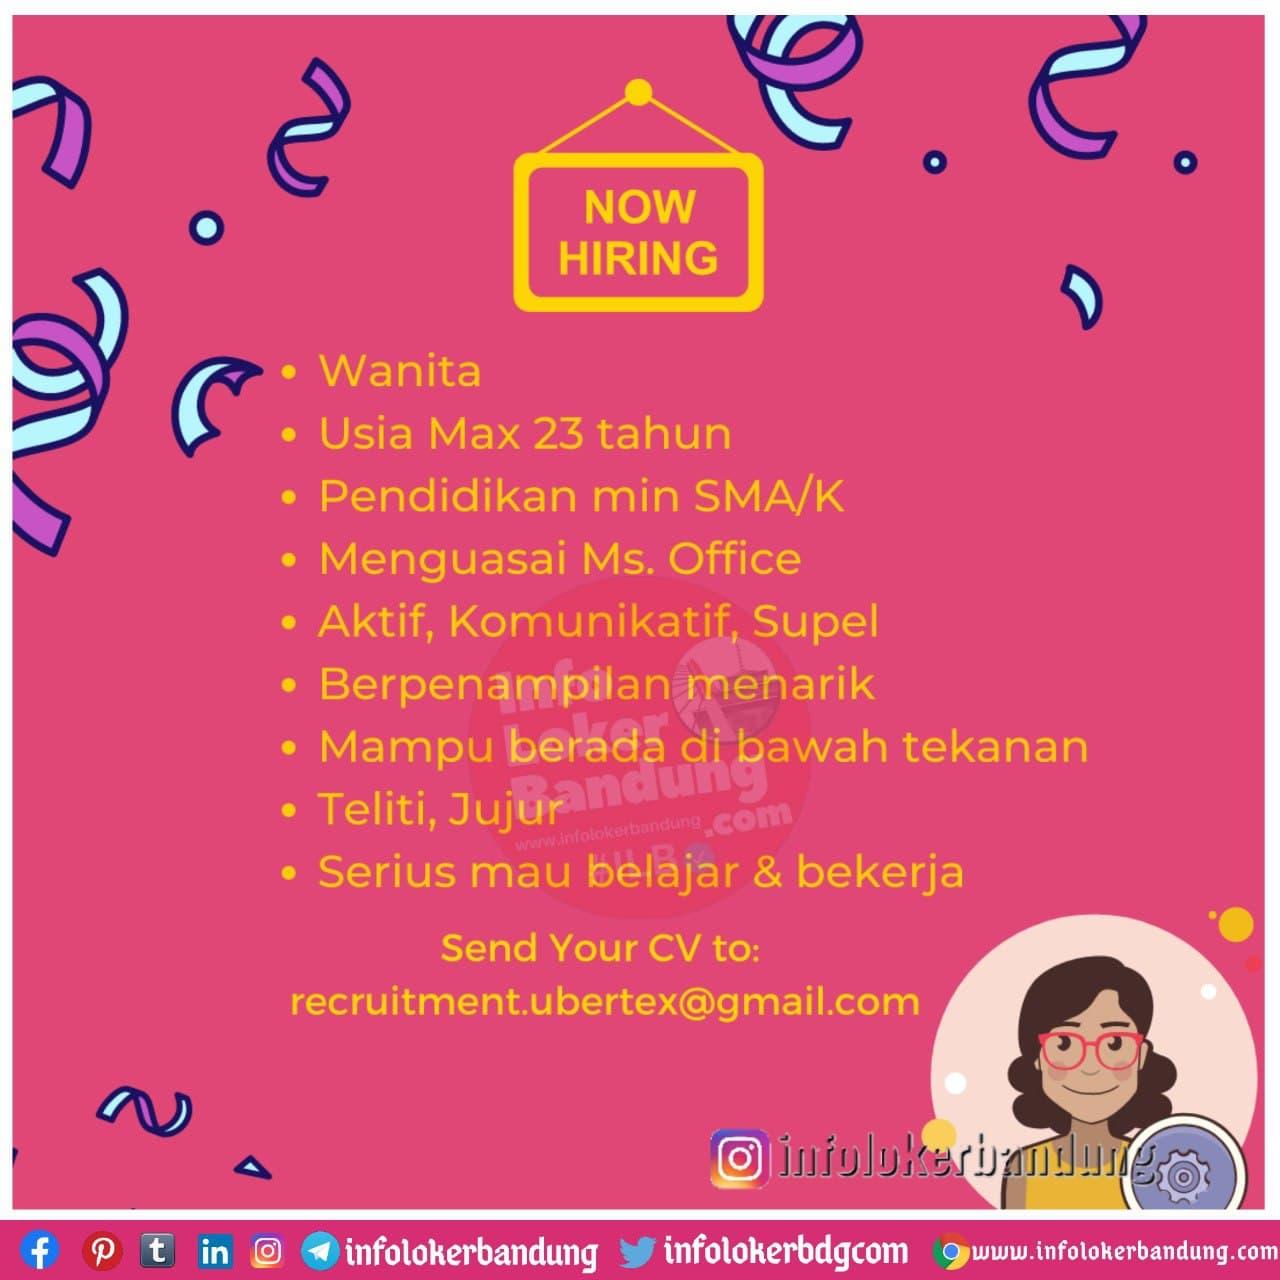 Lowongan Kerja Admin Gudang PT. Usaha Bersama Textile ( Ubertex ) Bandung Desember 2020